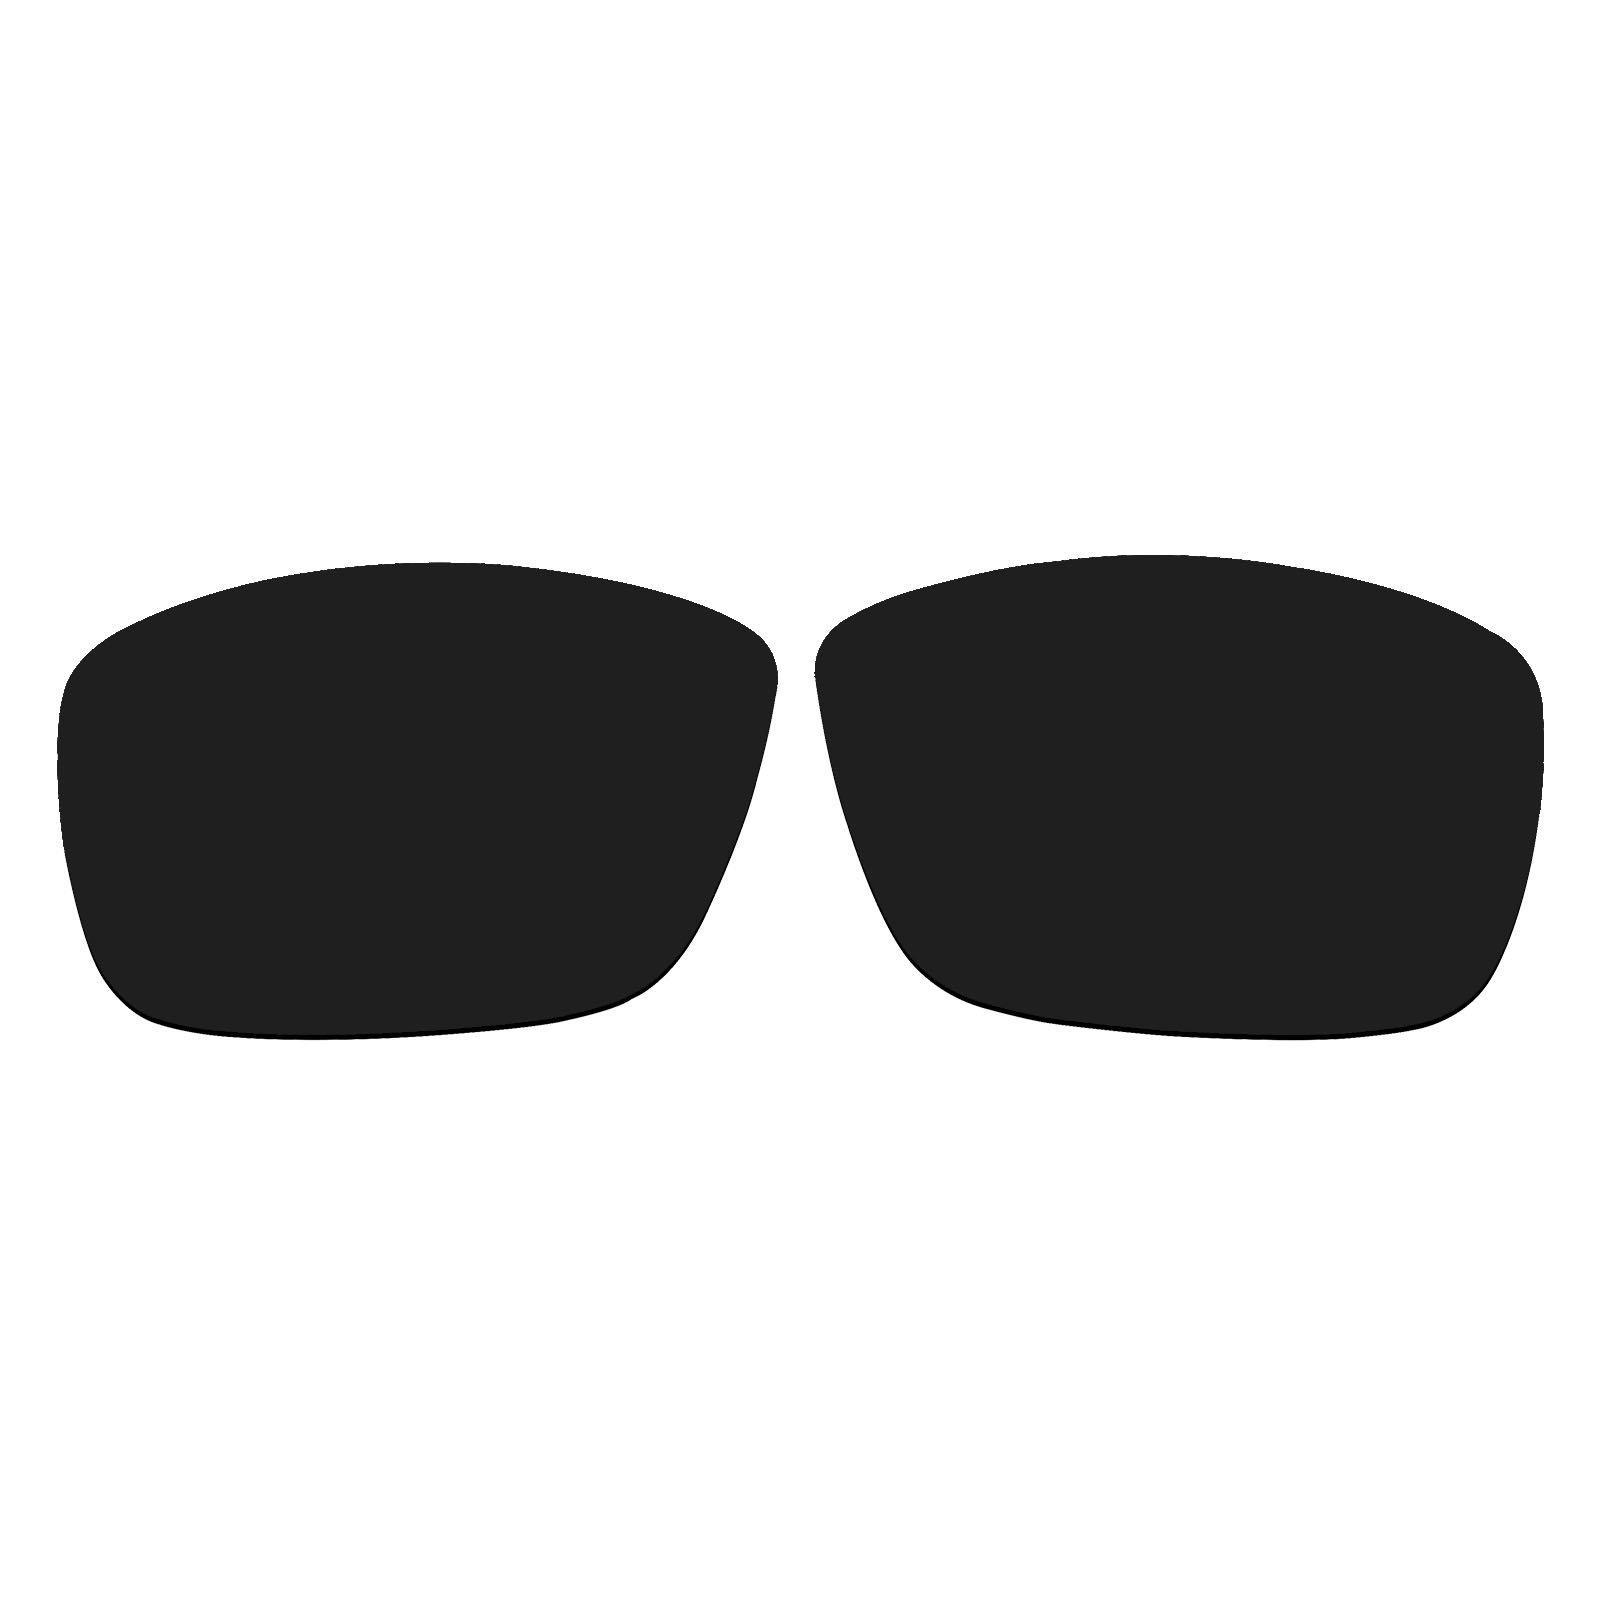 Polarized Replacement Sunglasses UV Lenses for Spy Optic Rocky- Black